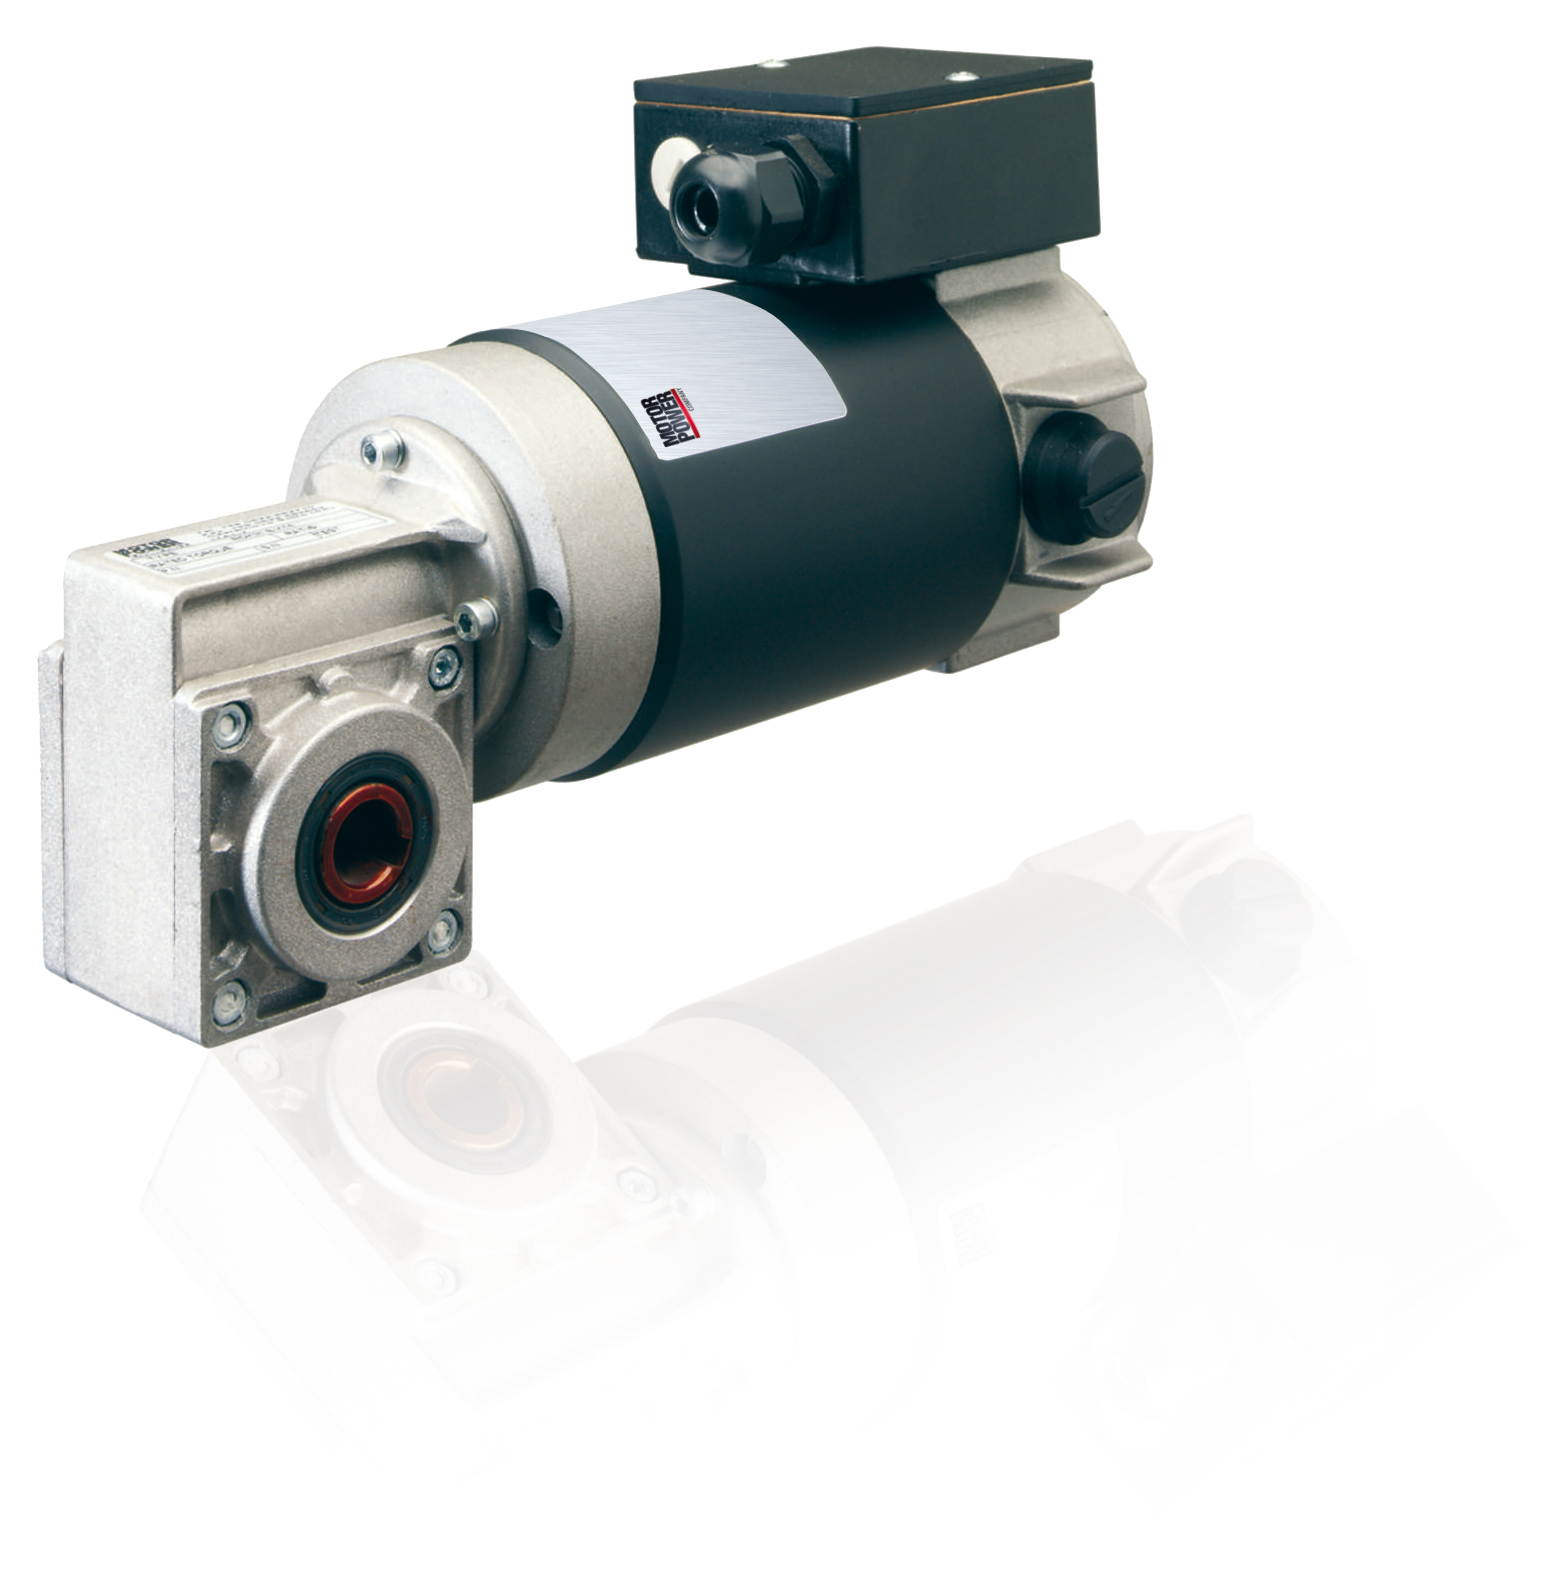 ROK涡轮蜗杆减速机